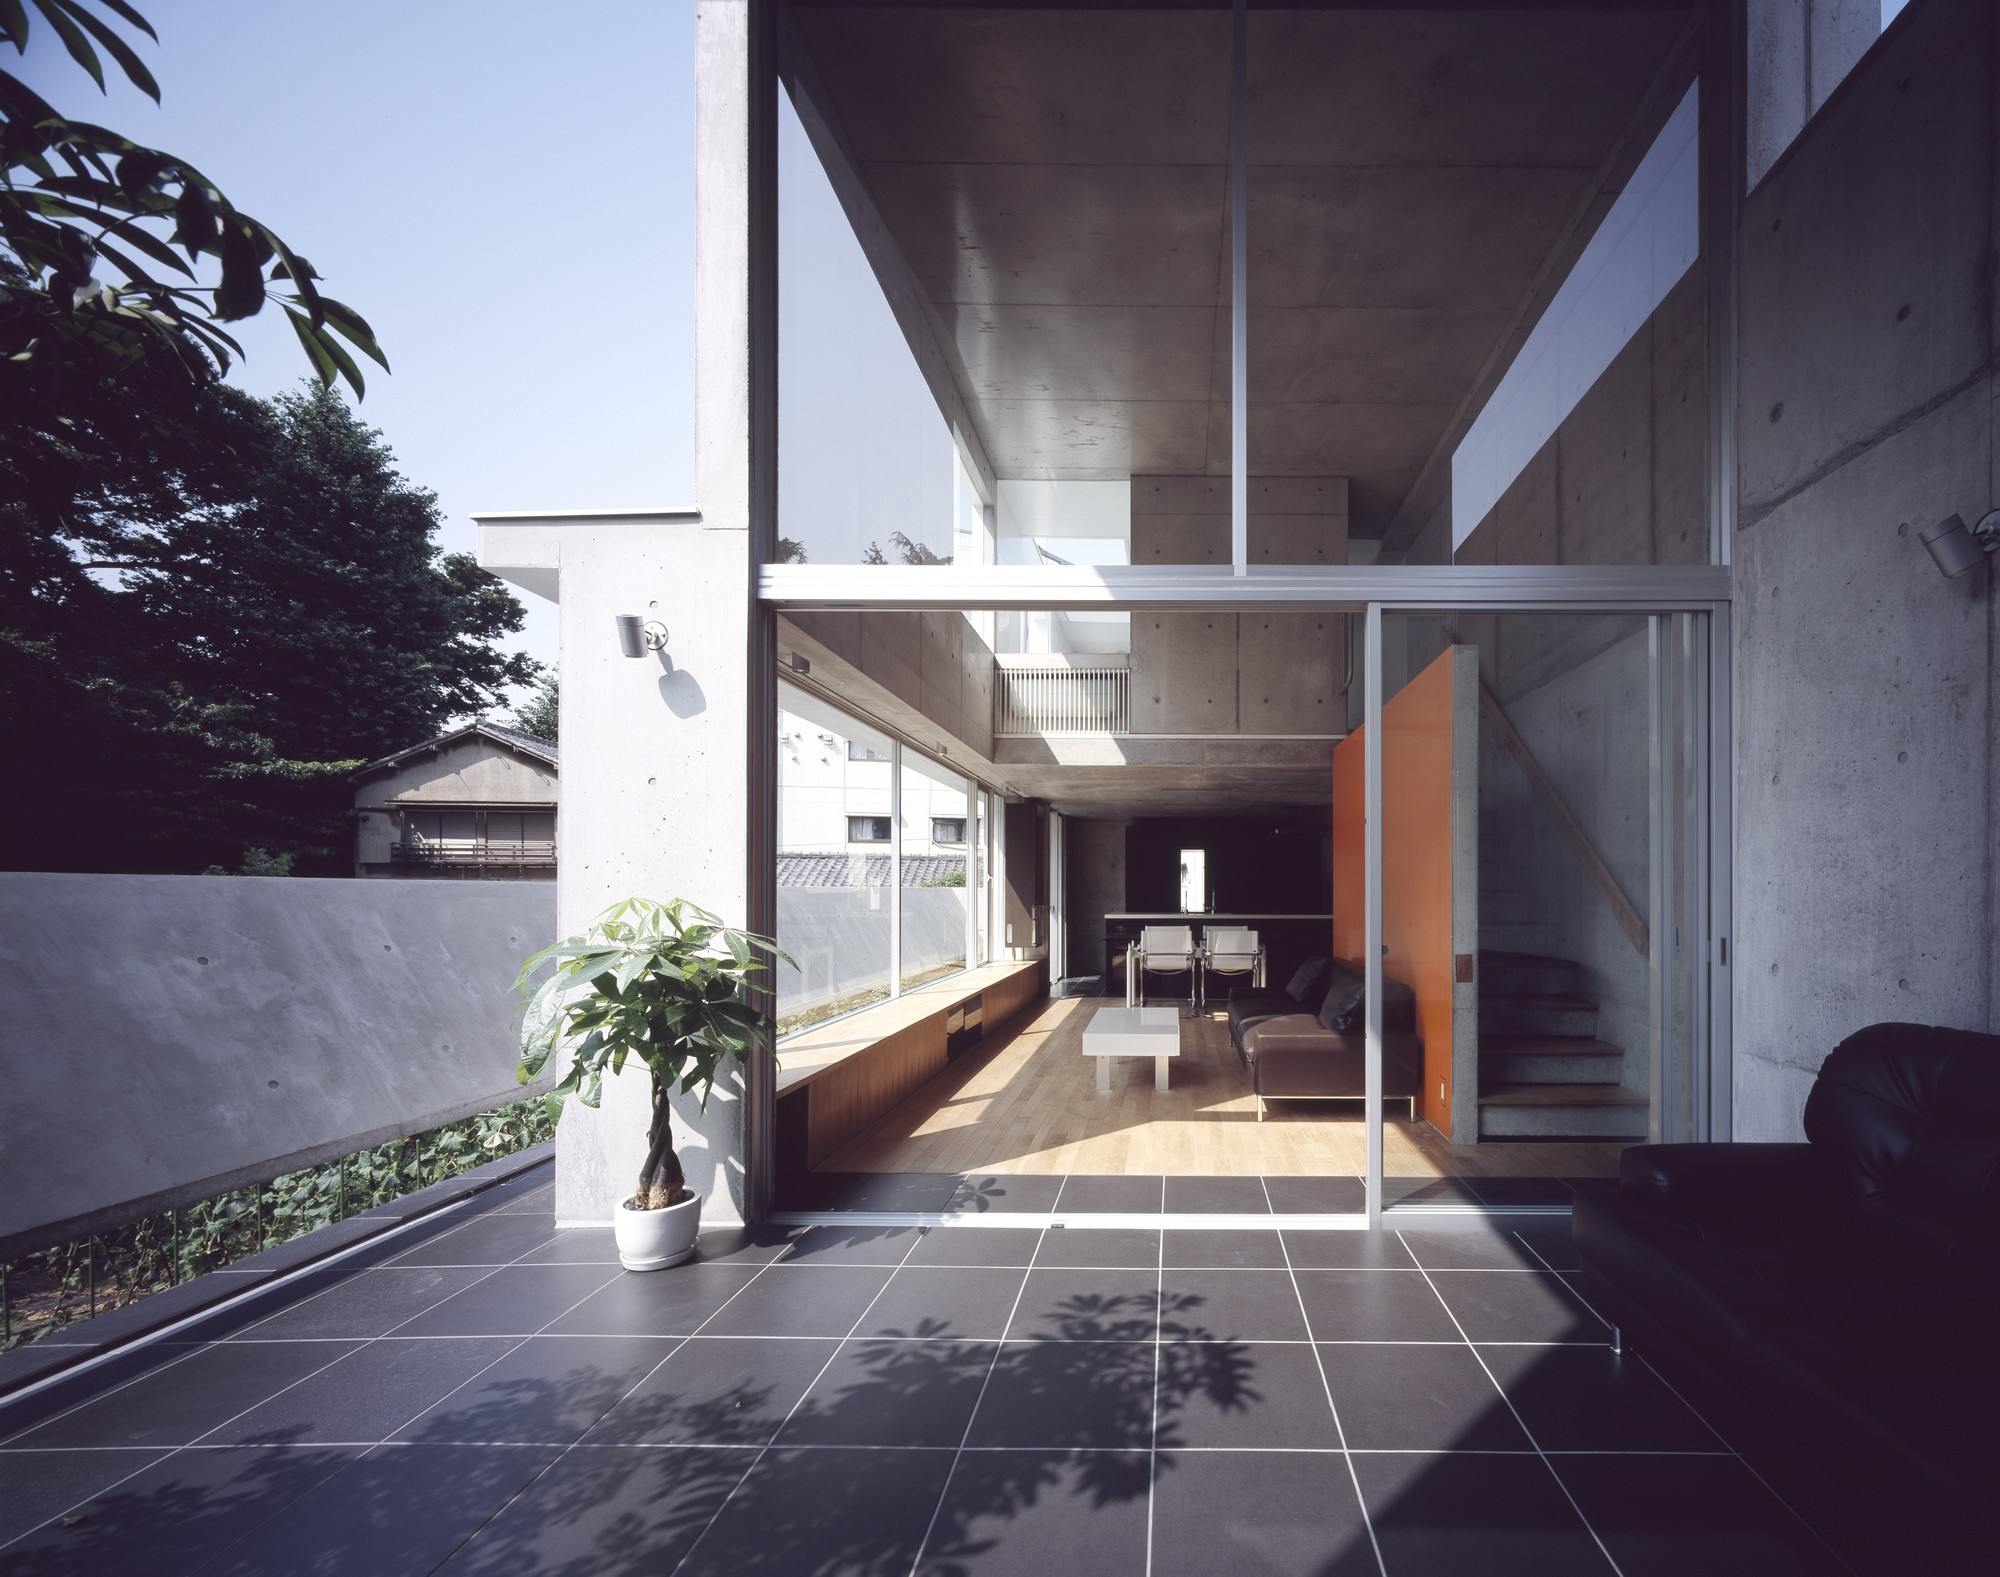 H-Orange / Takuro Yamamoto Architects